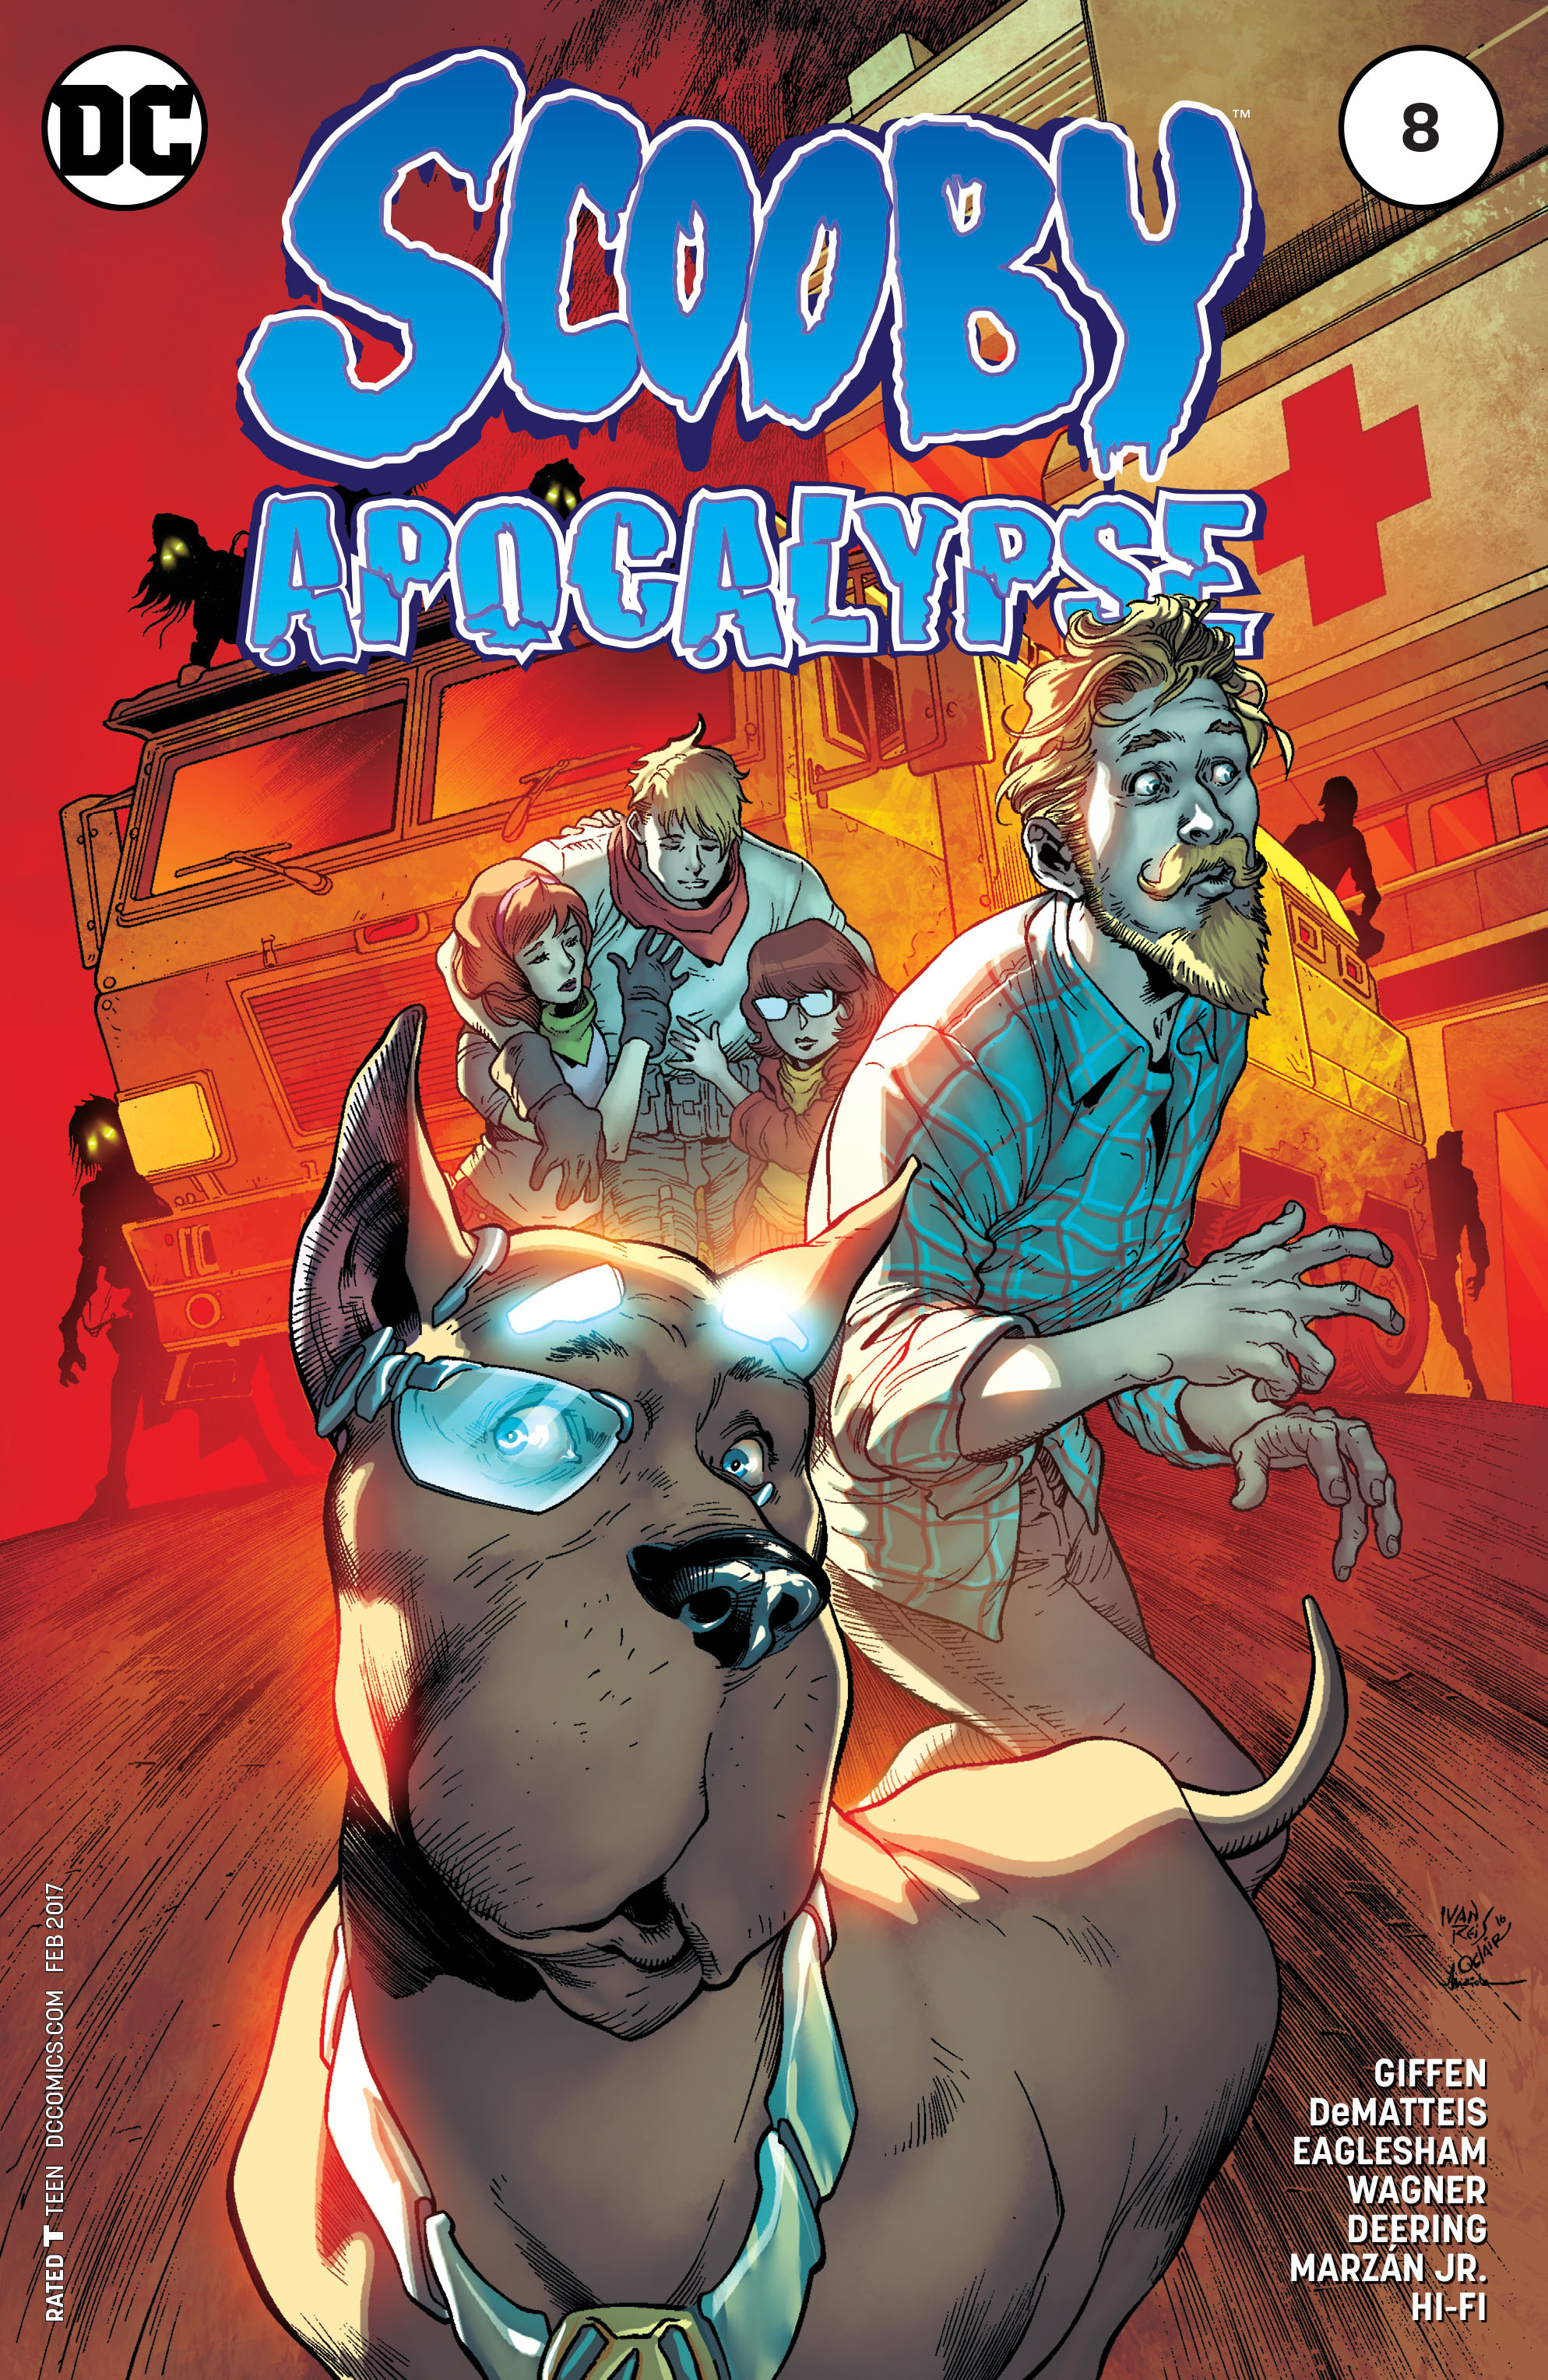 Read online Scooby Apocalypse comic -  Issue #8 - 3